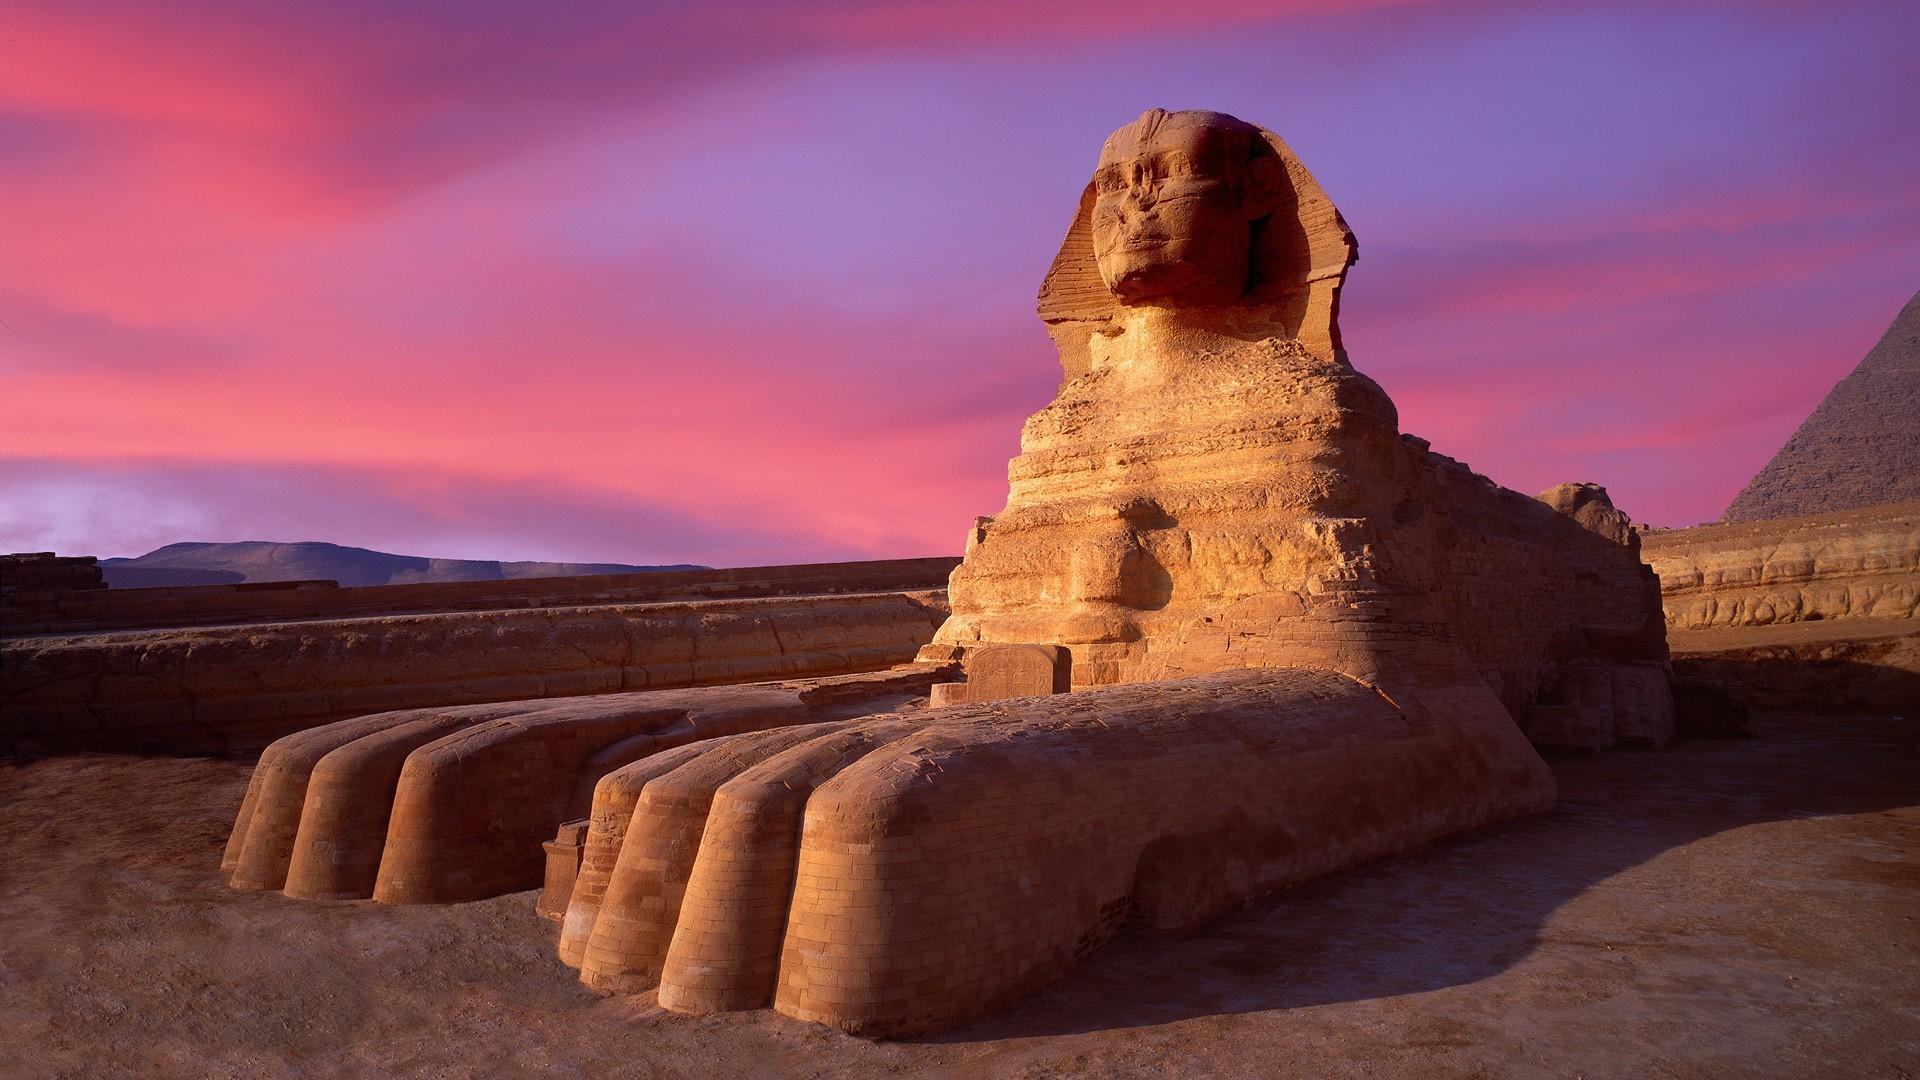 The Sphinx  Egypt  HD HD Wallpaper